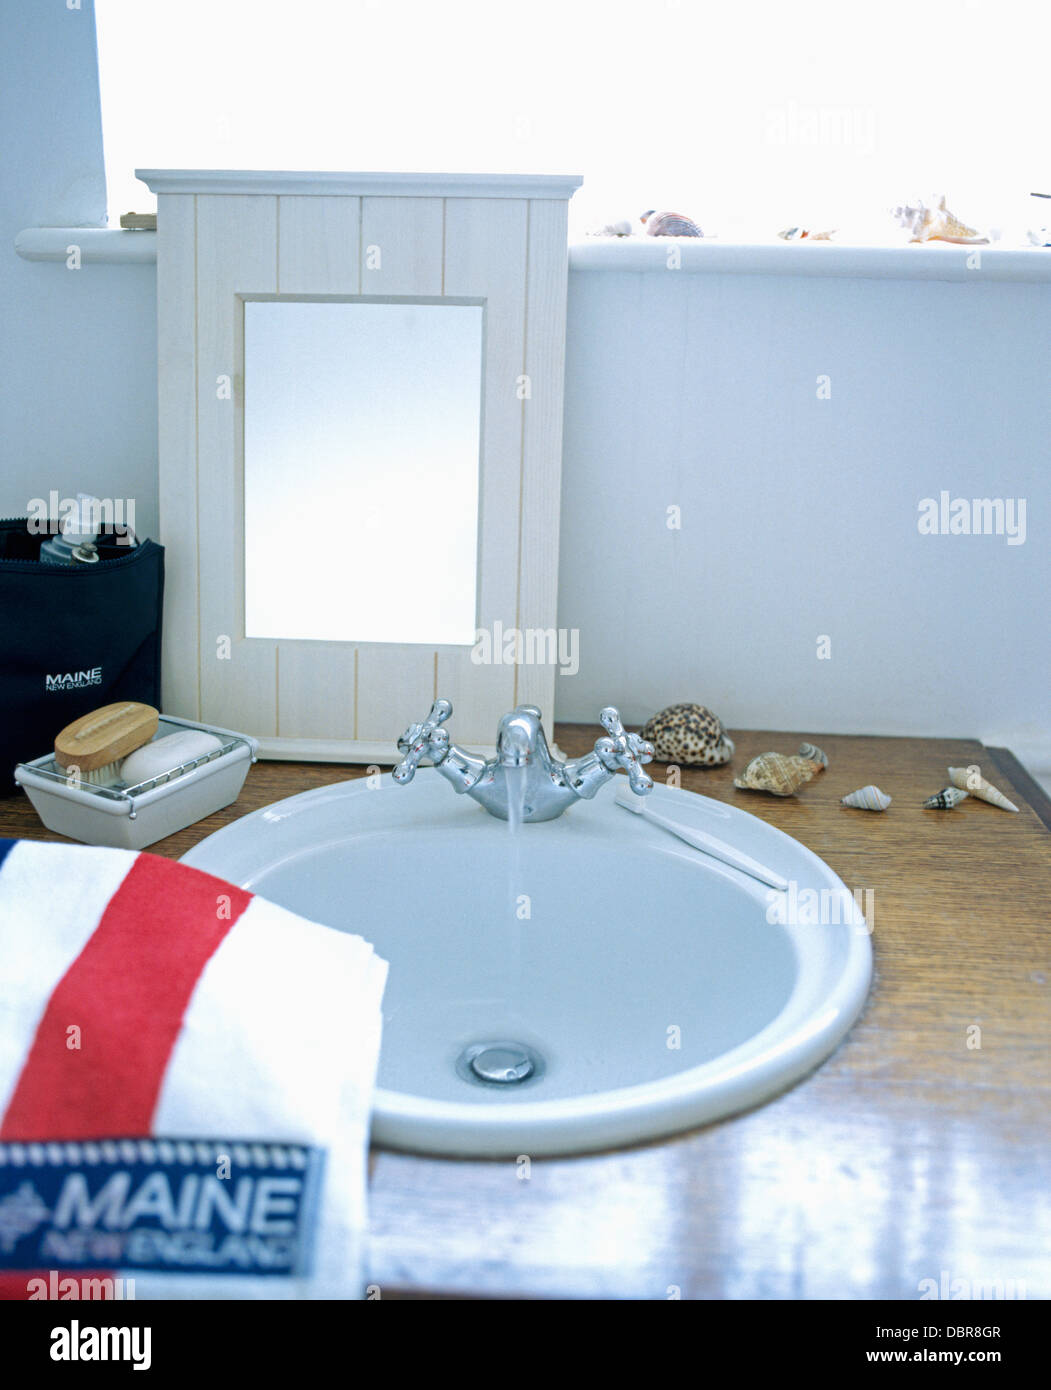 Bathroom Basin Mirror Monochromatic Stock Photos & Bathroom Basin ...